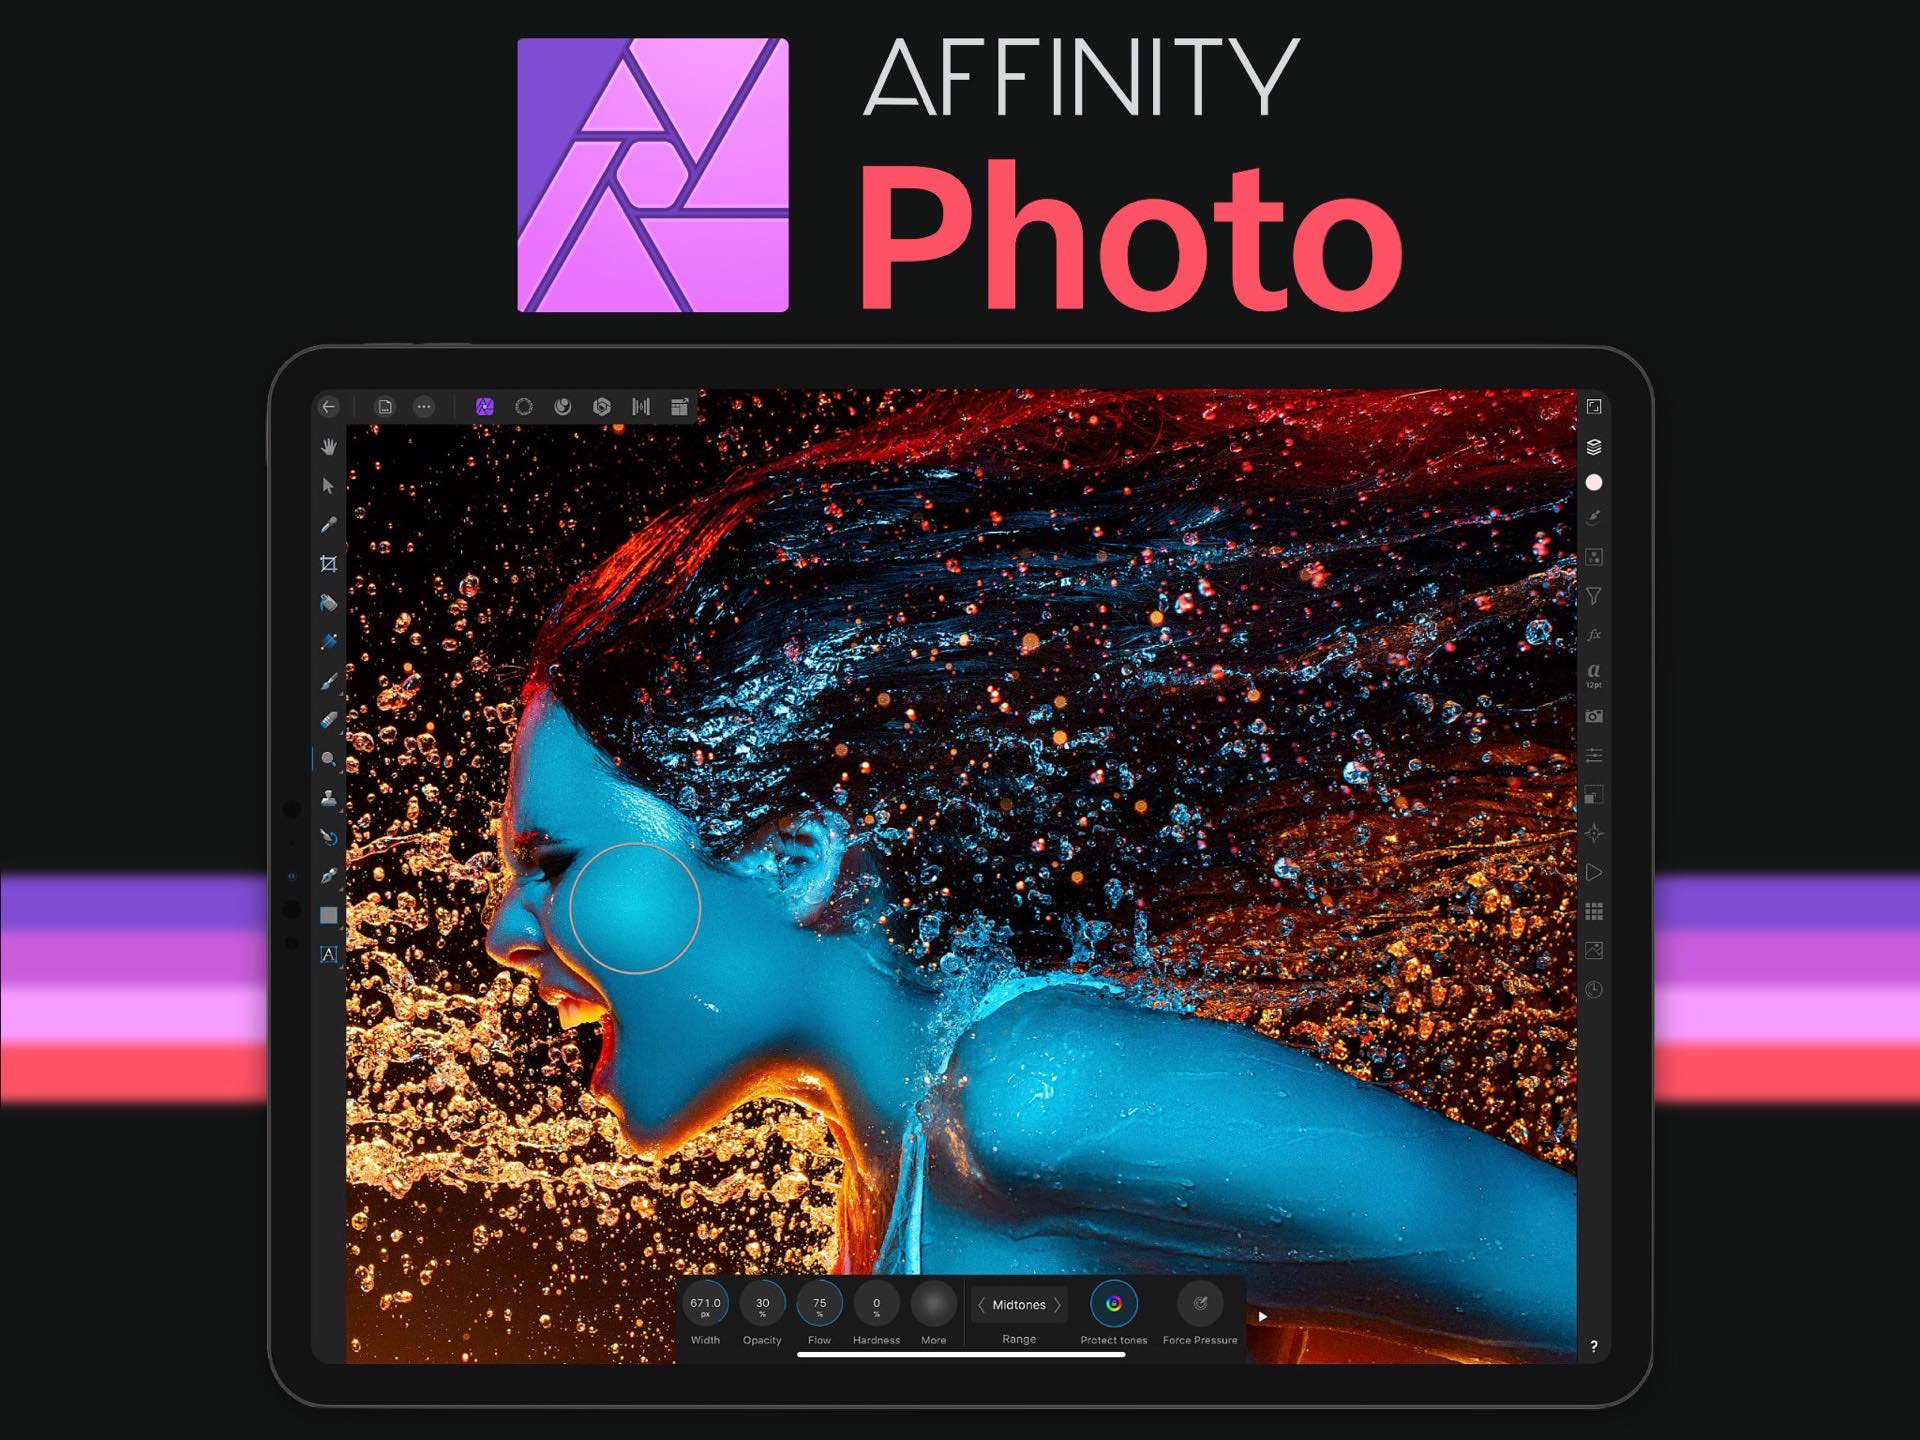 affinity-photo-for-ipad